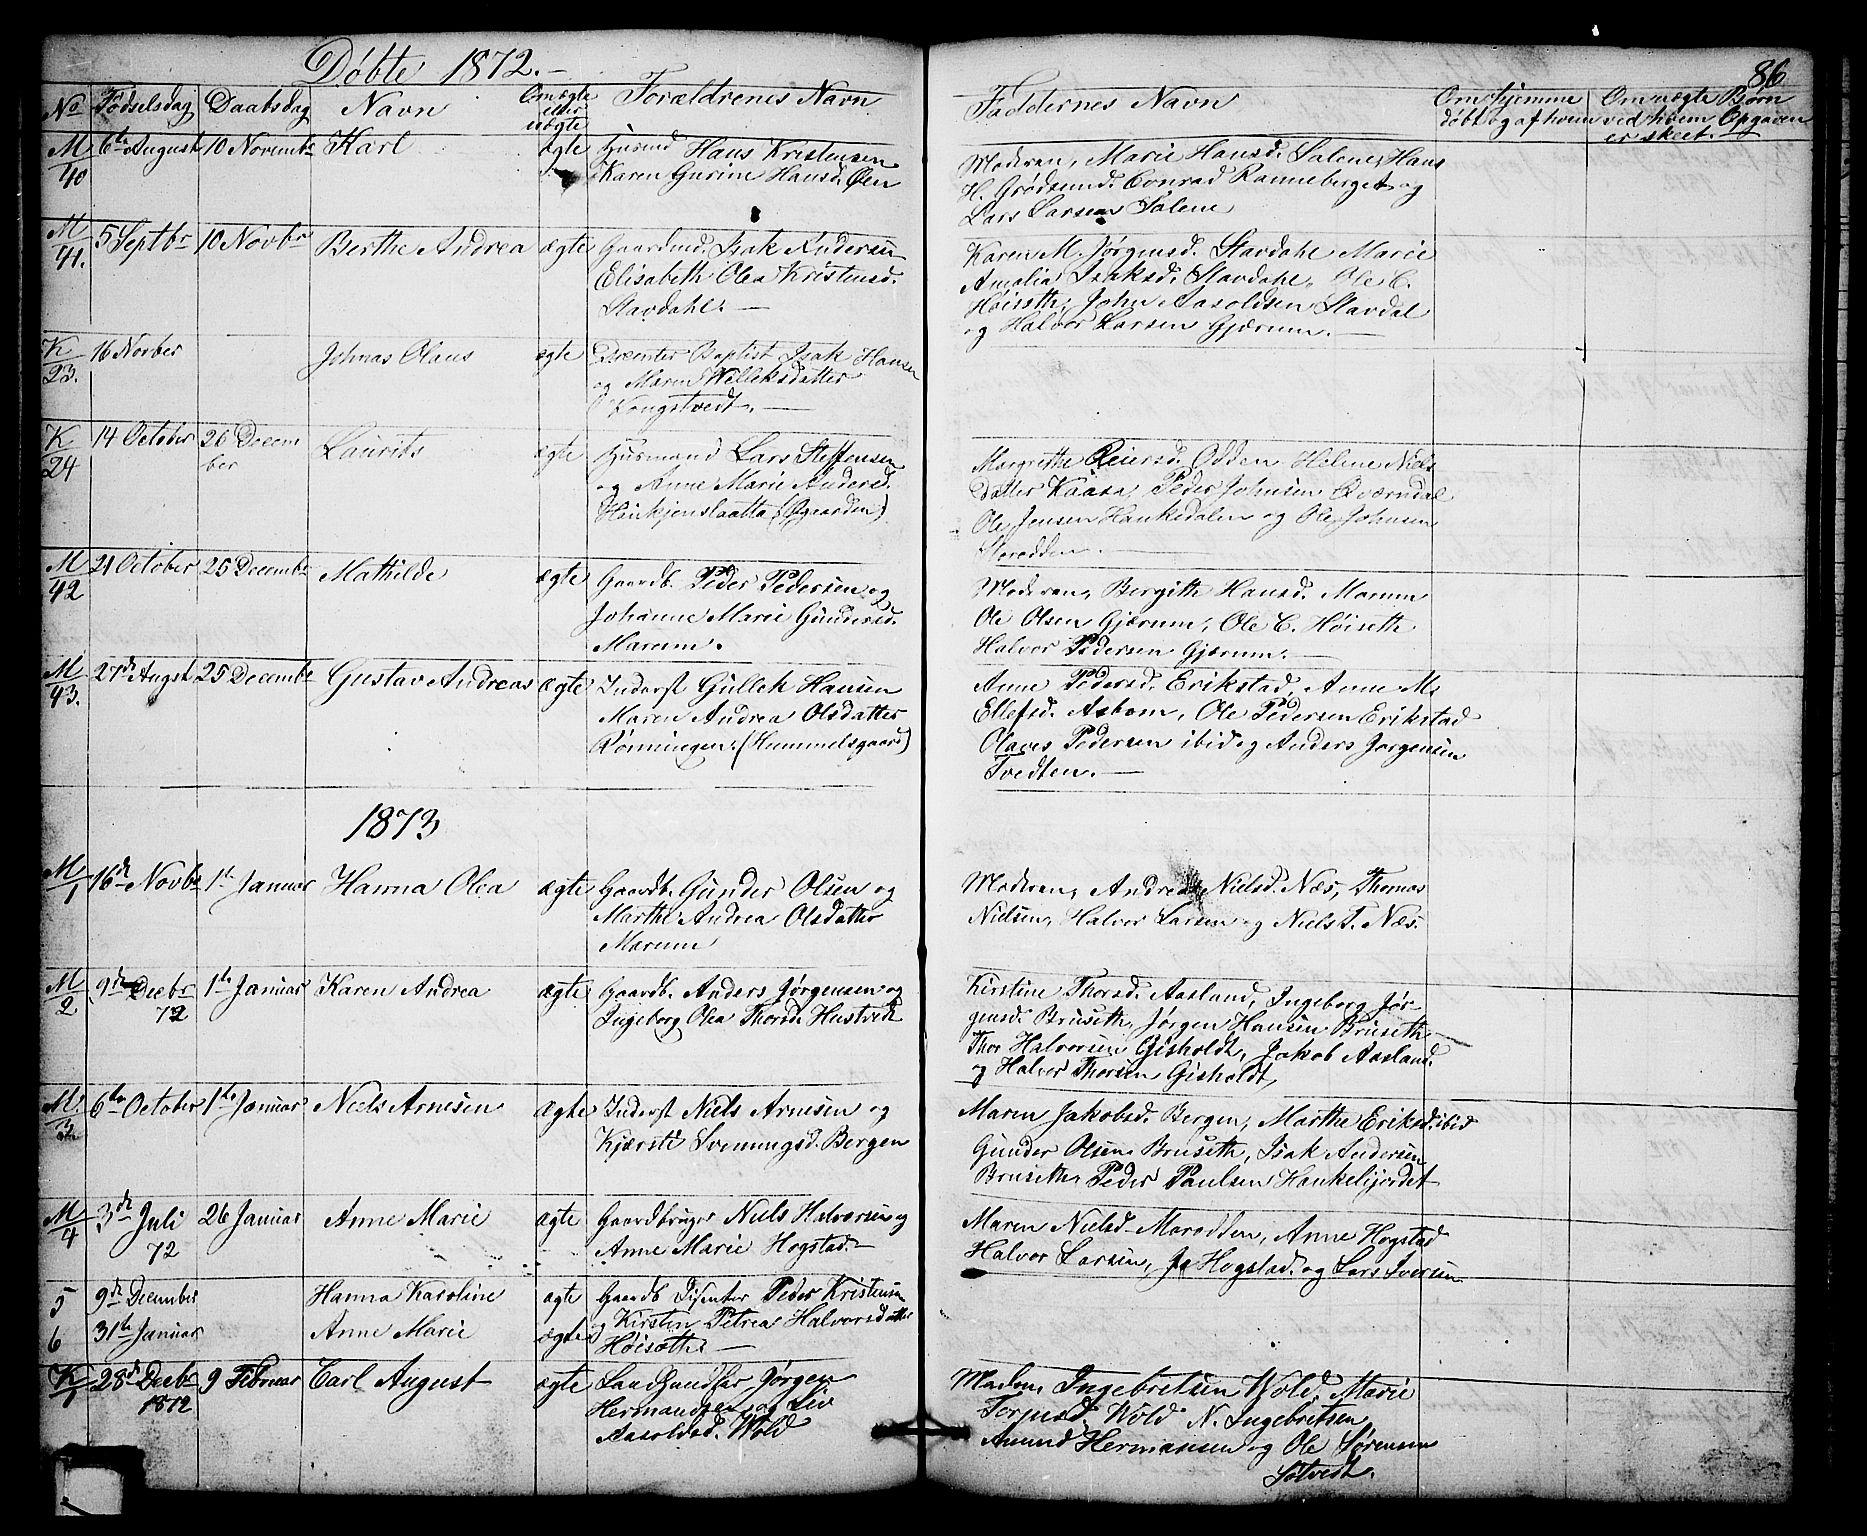 SAKO, Solum kirkebøker, G/Gb/L0002: Klokkerbok nr. II 2, 1859-1879, s. 86